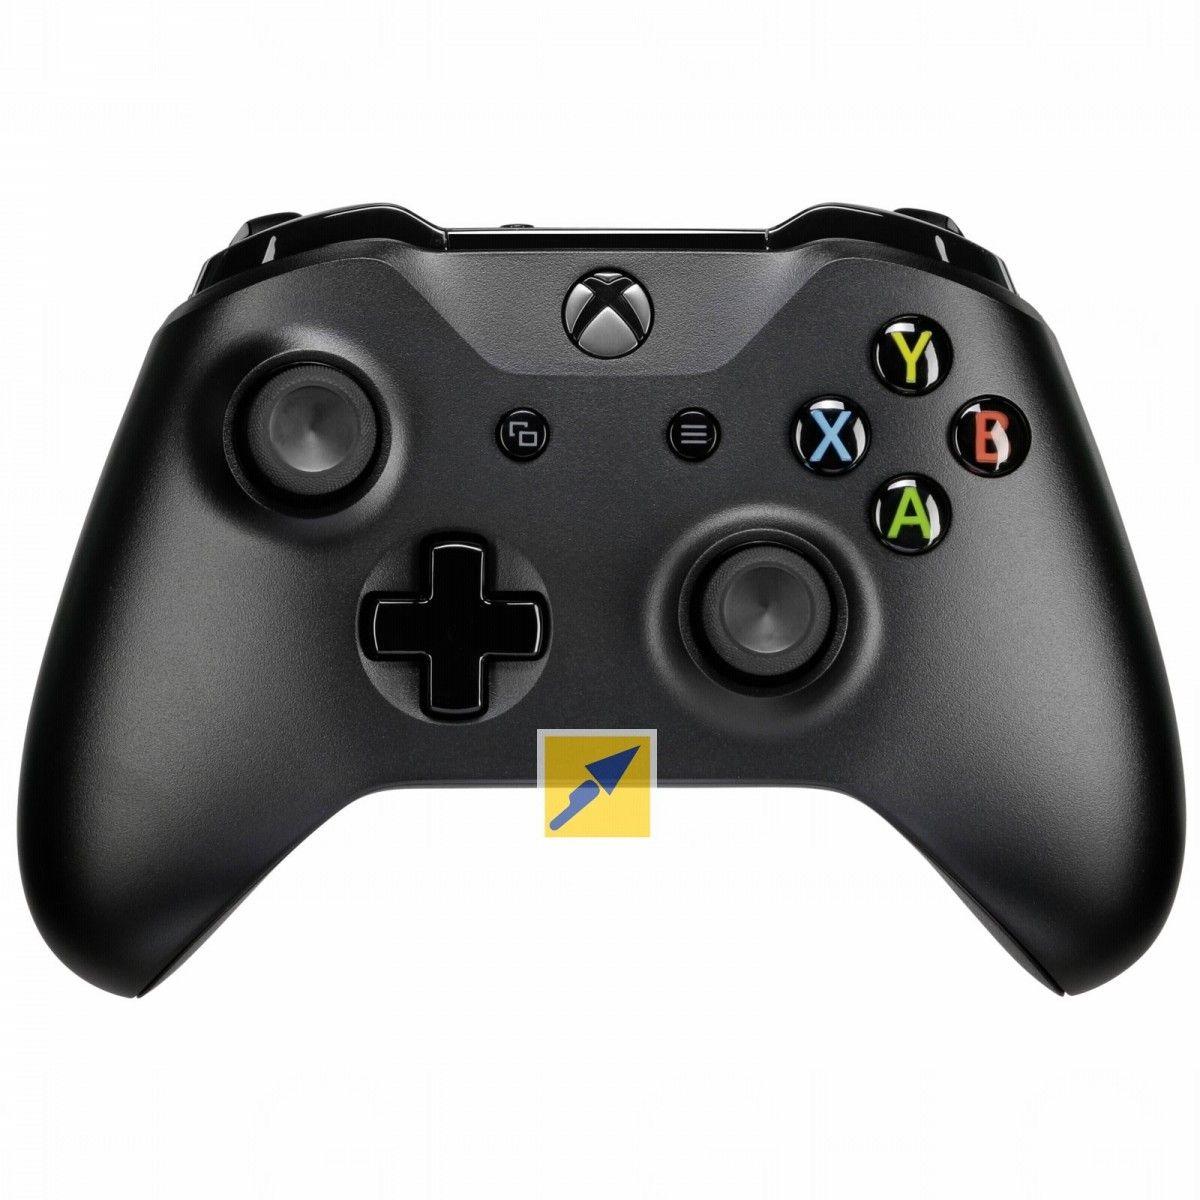 [Masterpass] Technikdirekt Fehler: Alles portofrei bestellen z. B. Xbox One Controller & 2x 9V Batterien